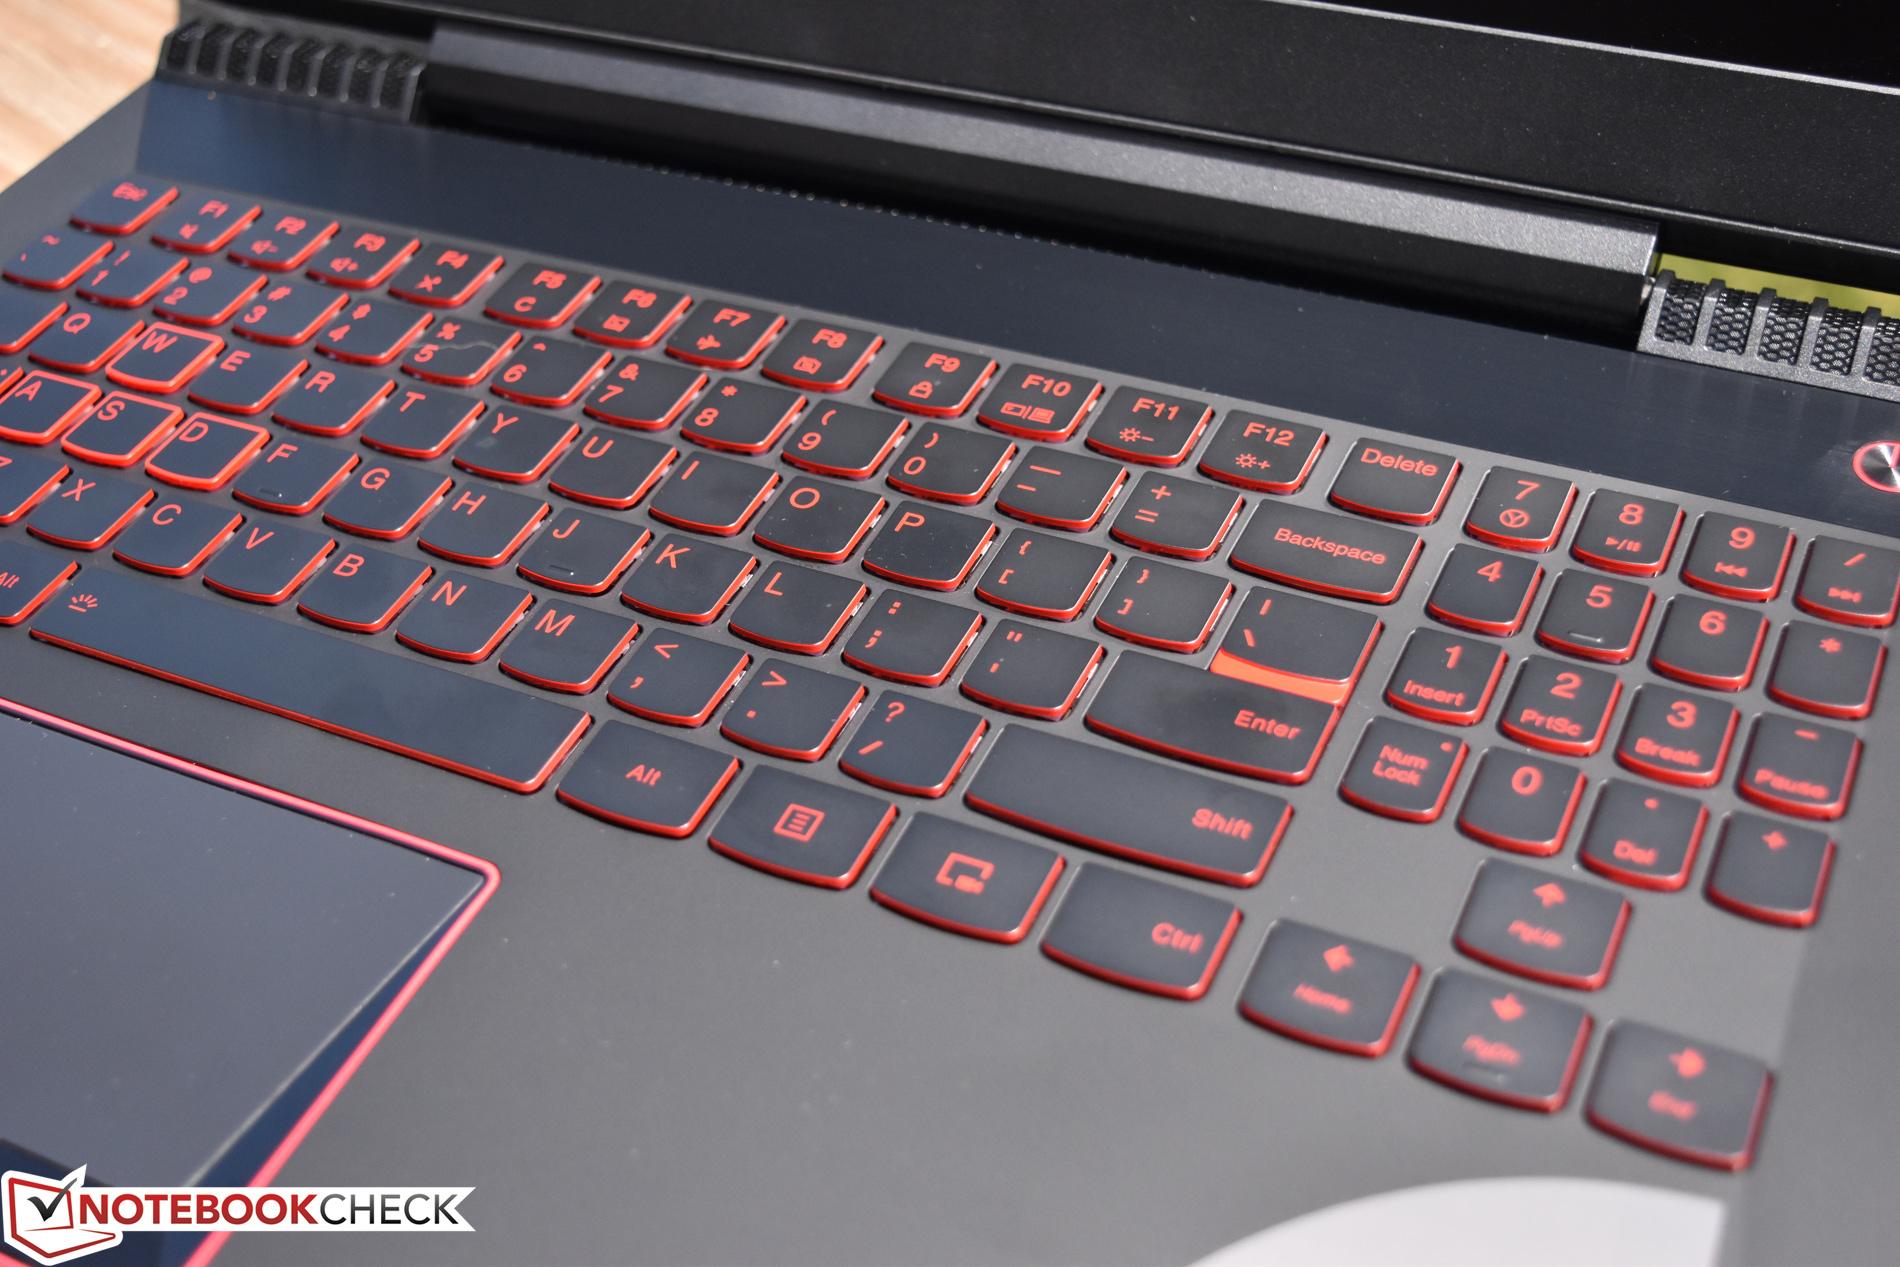 Kisa Inceleme Lenovo Legion Y520 15ikbn 7700hq Fhd Gtx 1050 Ti Laptop Notebookcheck Tr Com